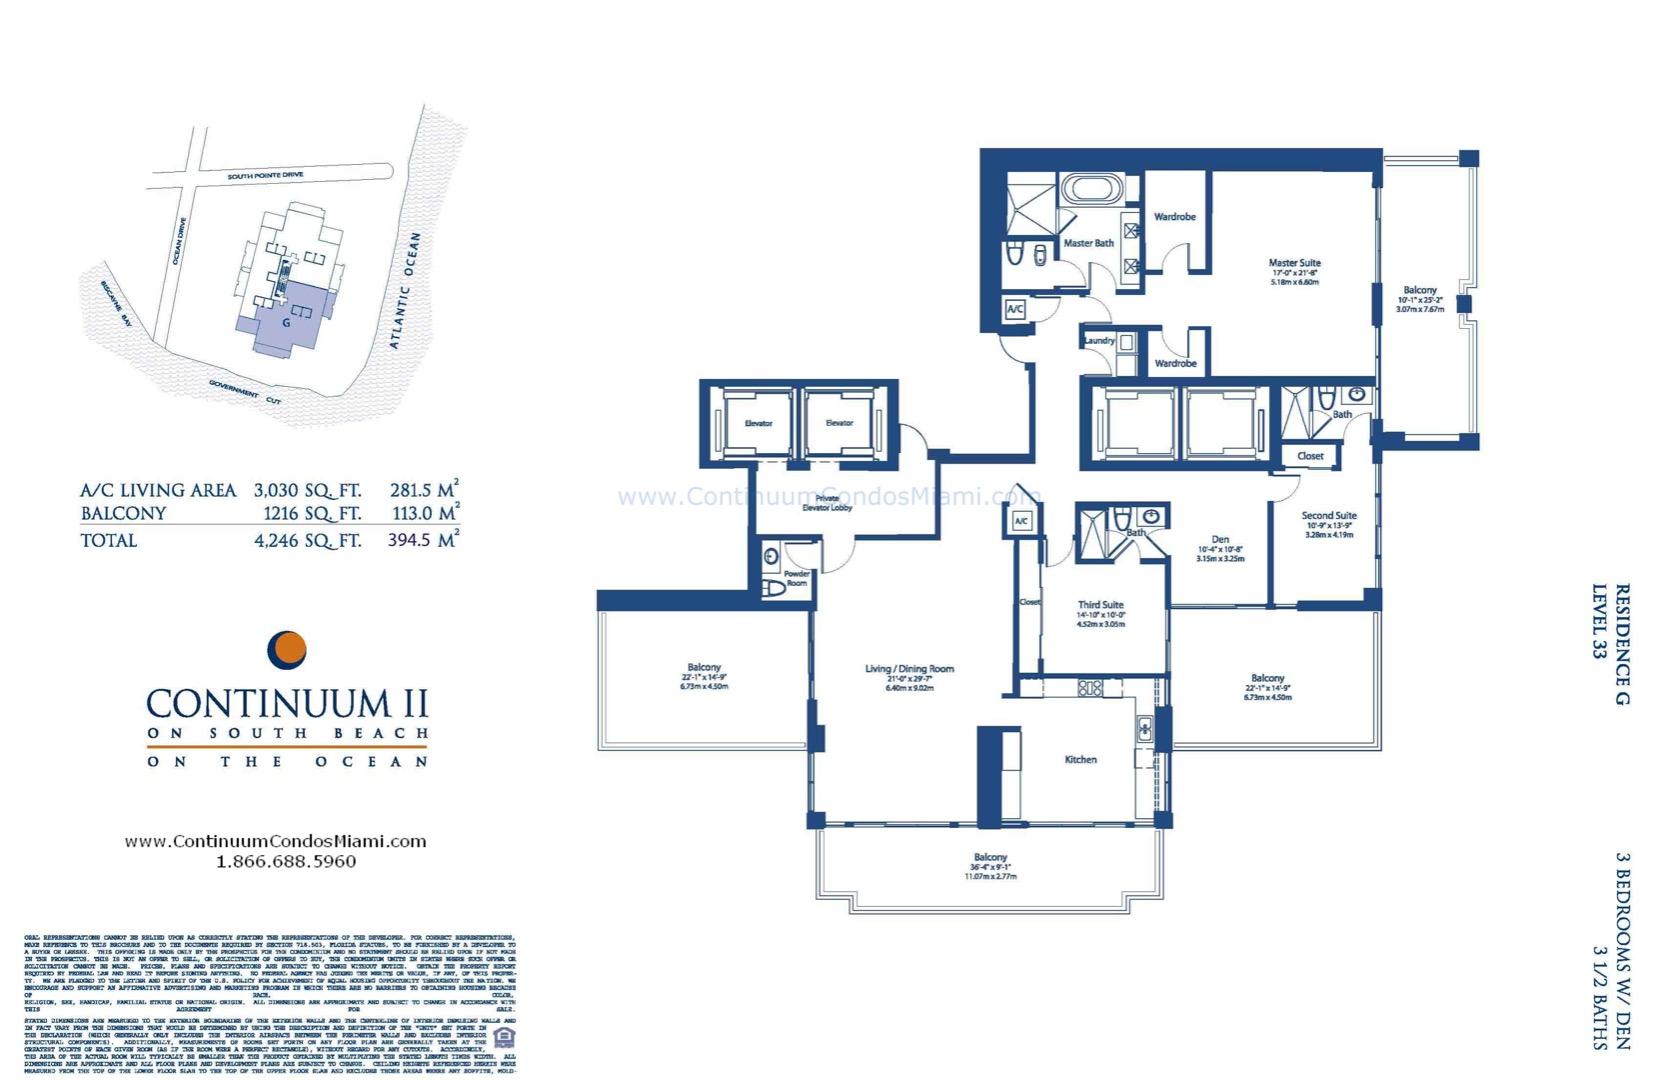 Floor plan image G - 4/4/1  - 3030 sqft image